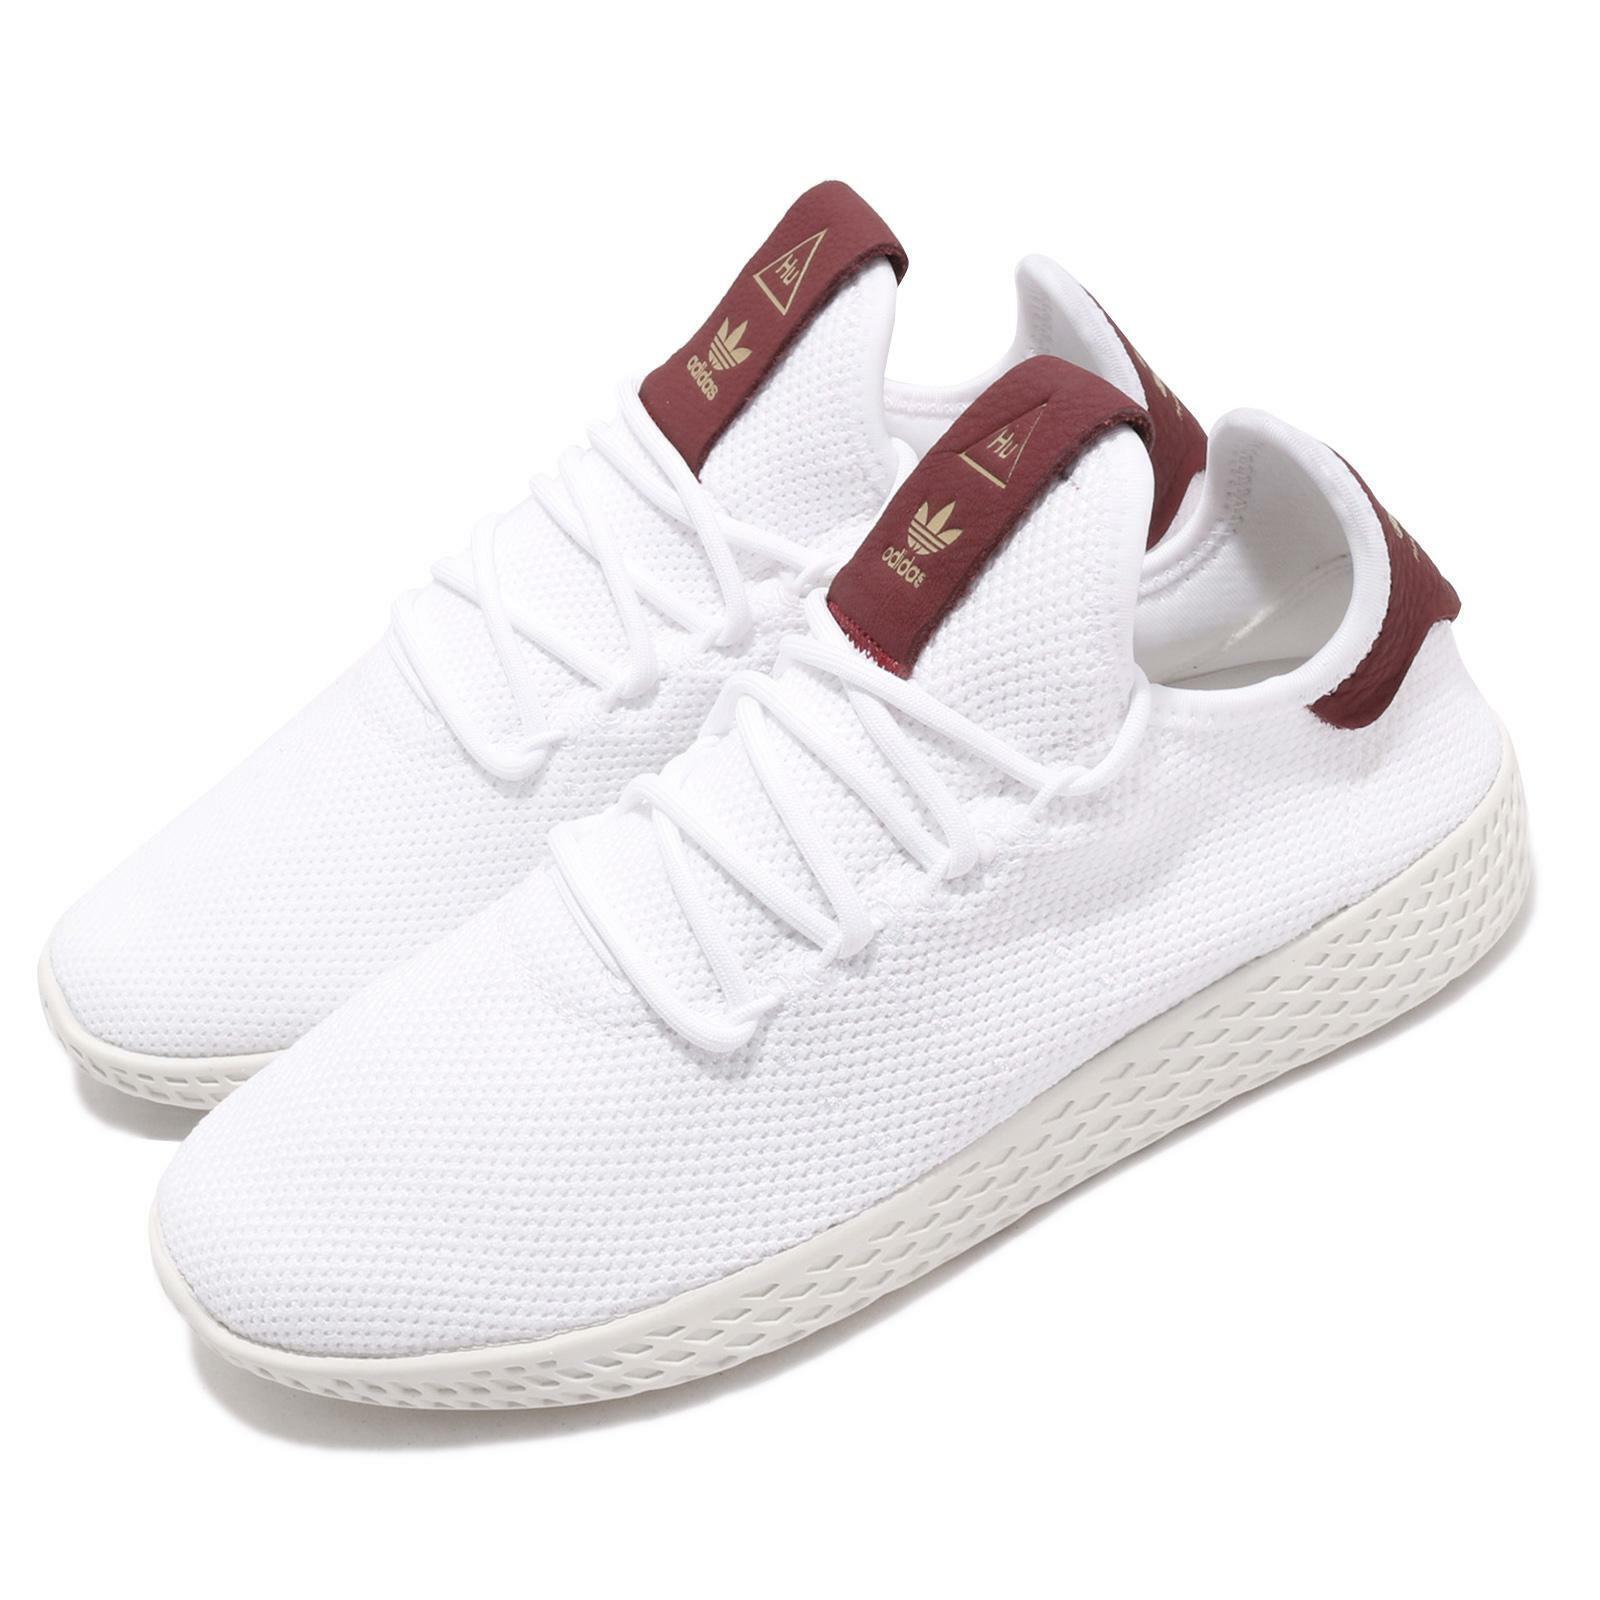 adidas Originals PW Tennis Hu W Pharrell Williams White Burgundy Women D96443